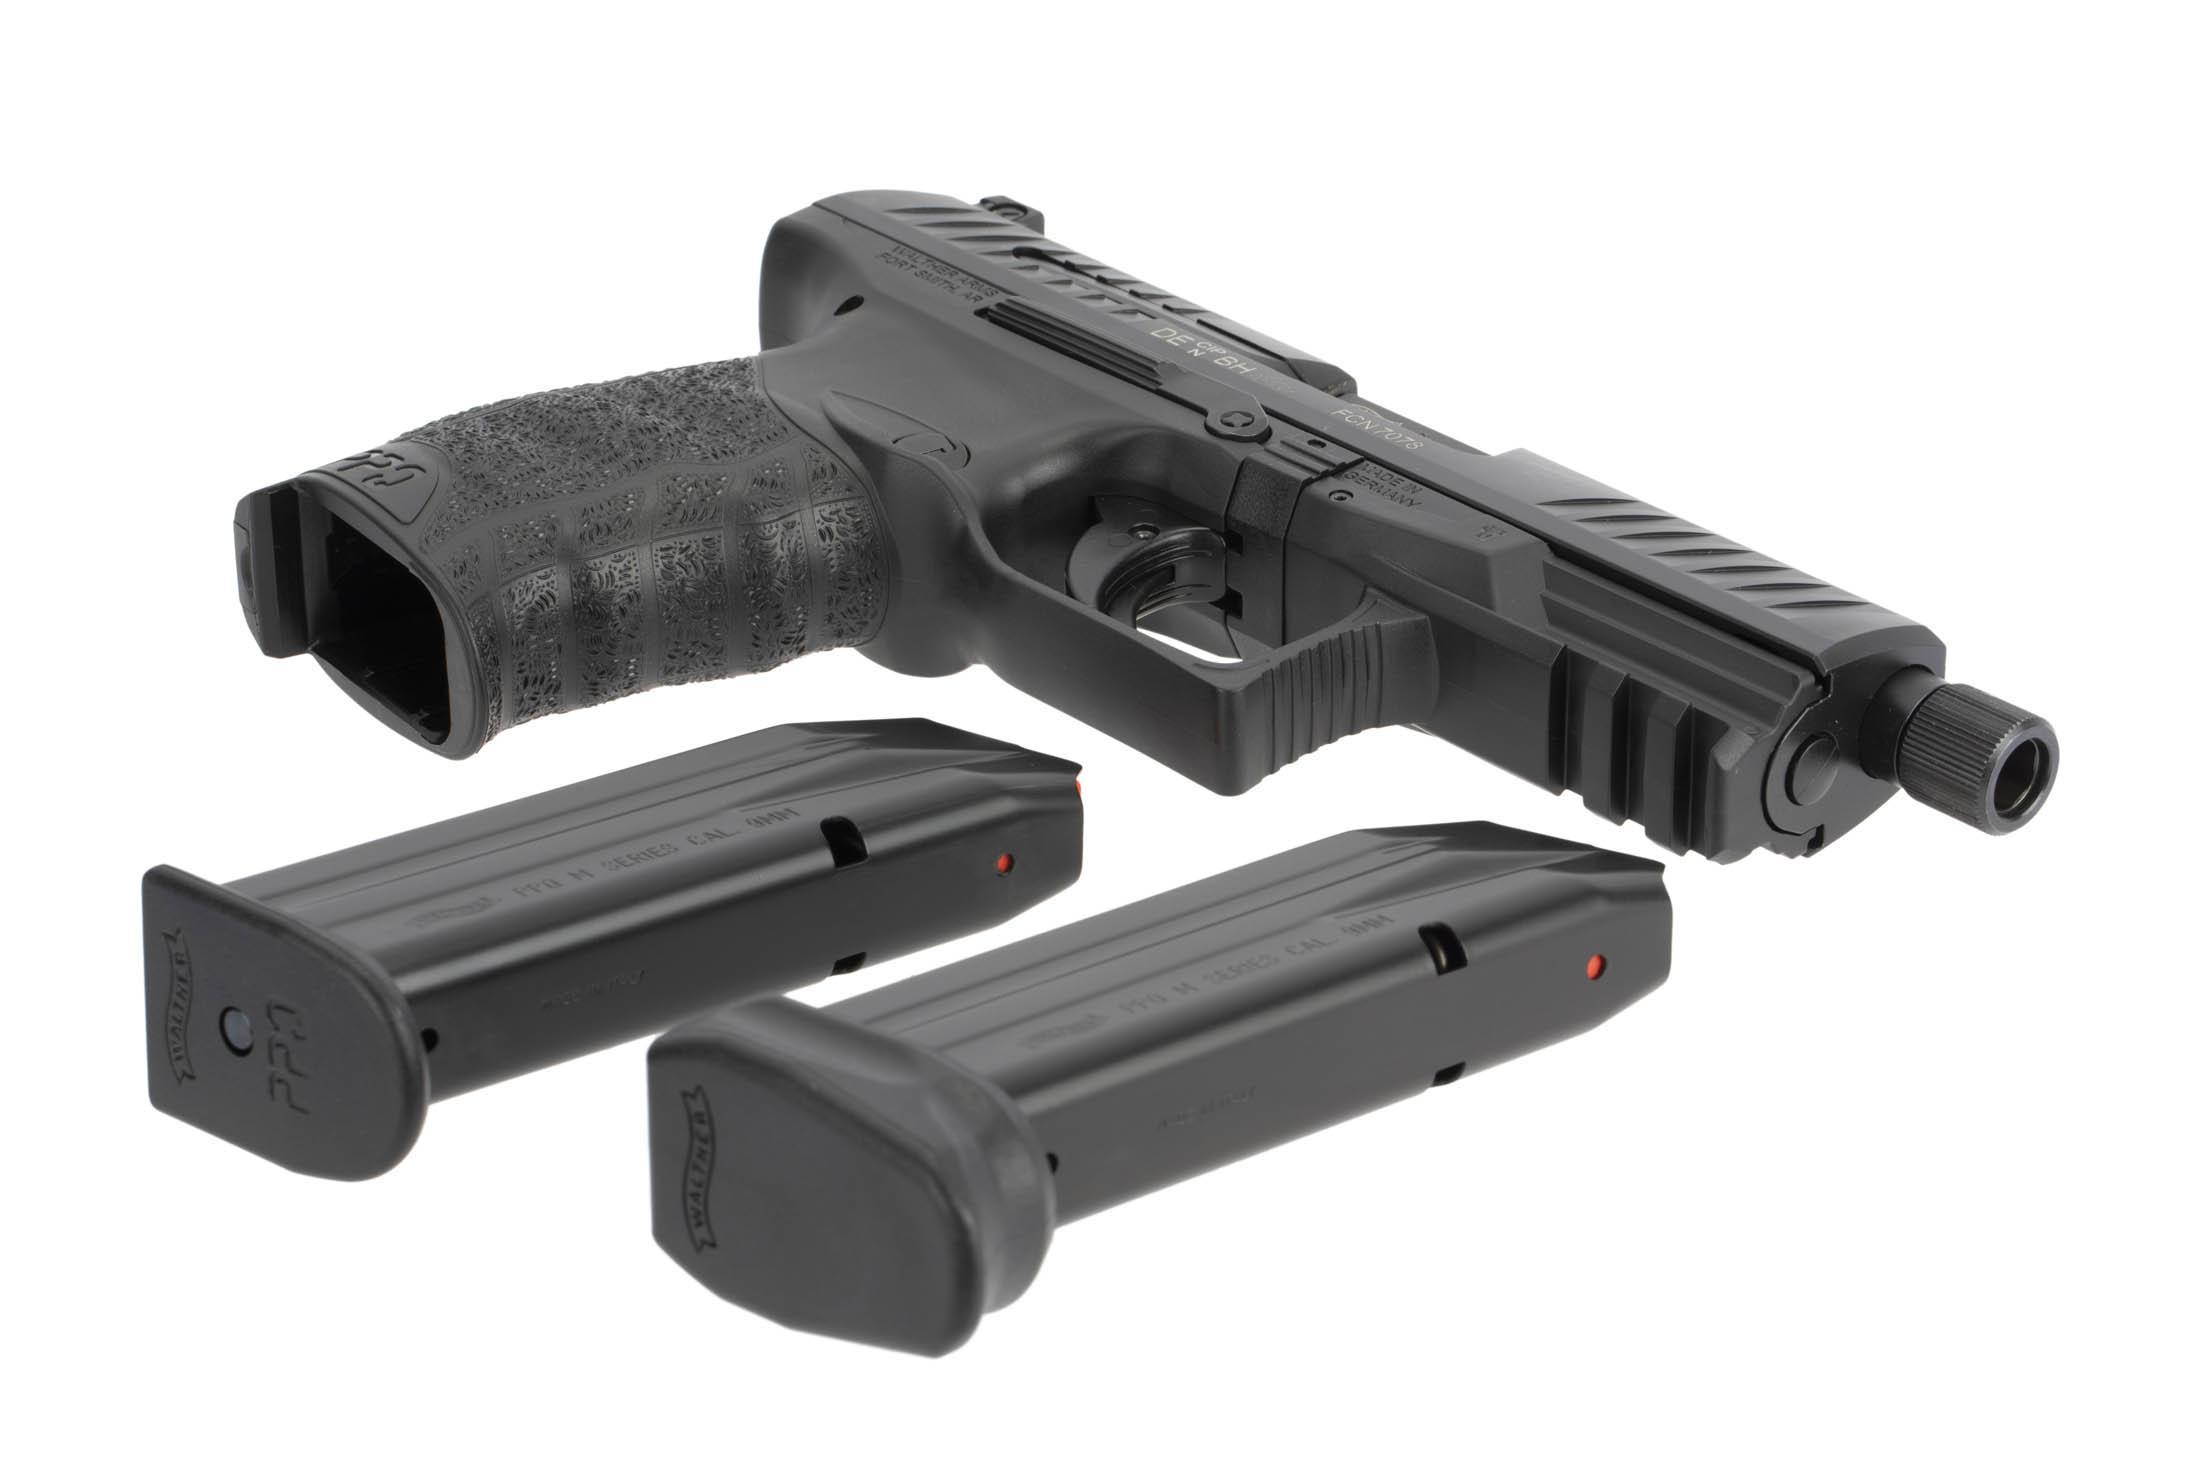 Walther PPQ M2 Navy 9mm Compact Handgun with 15/17-Round Magazines - 4 6